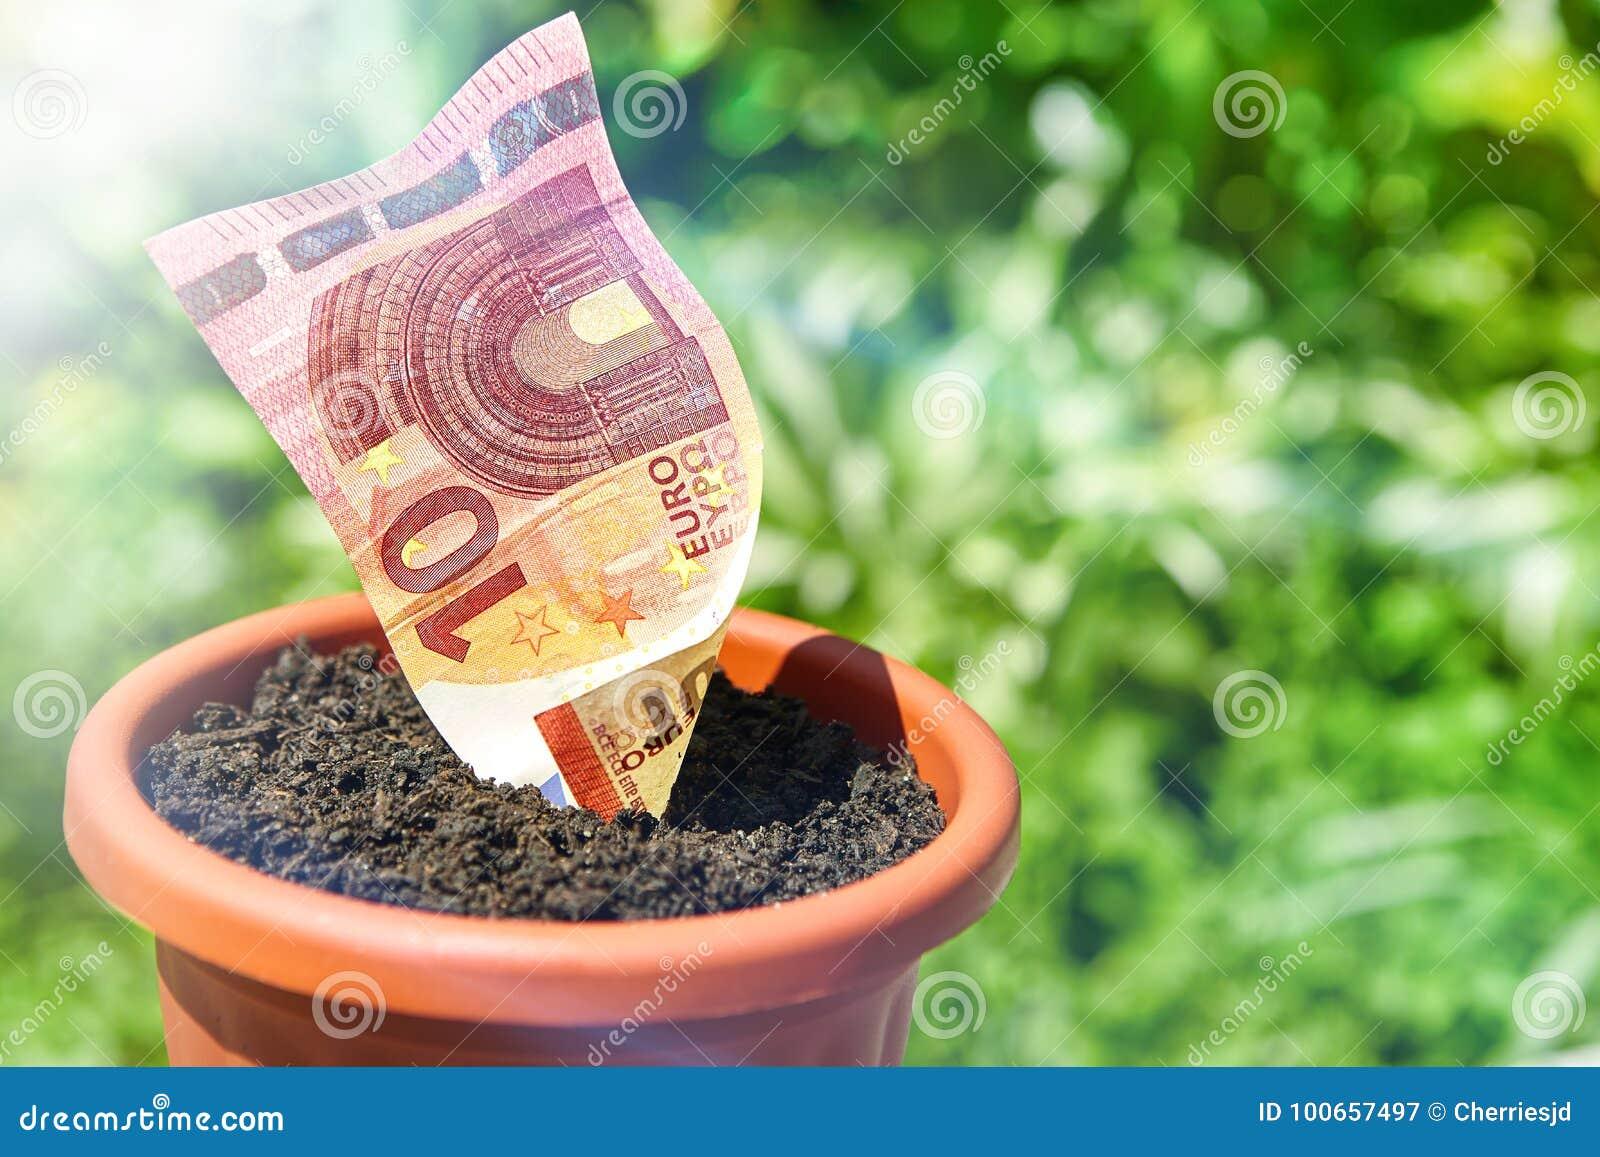 Growing money in flowerpots